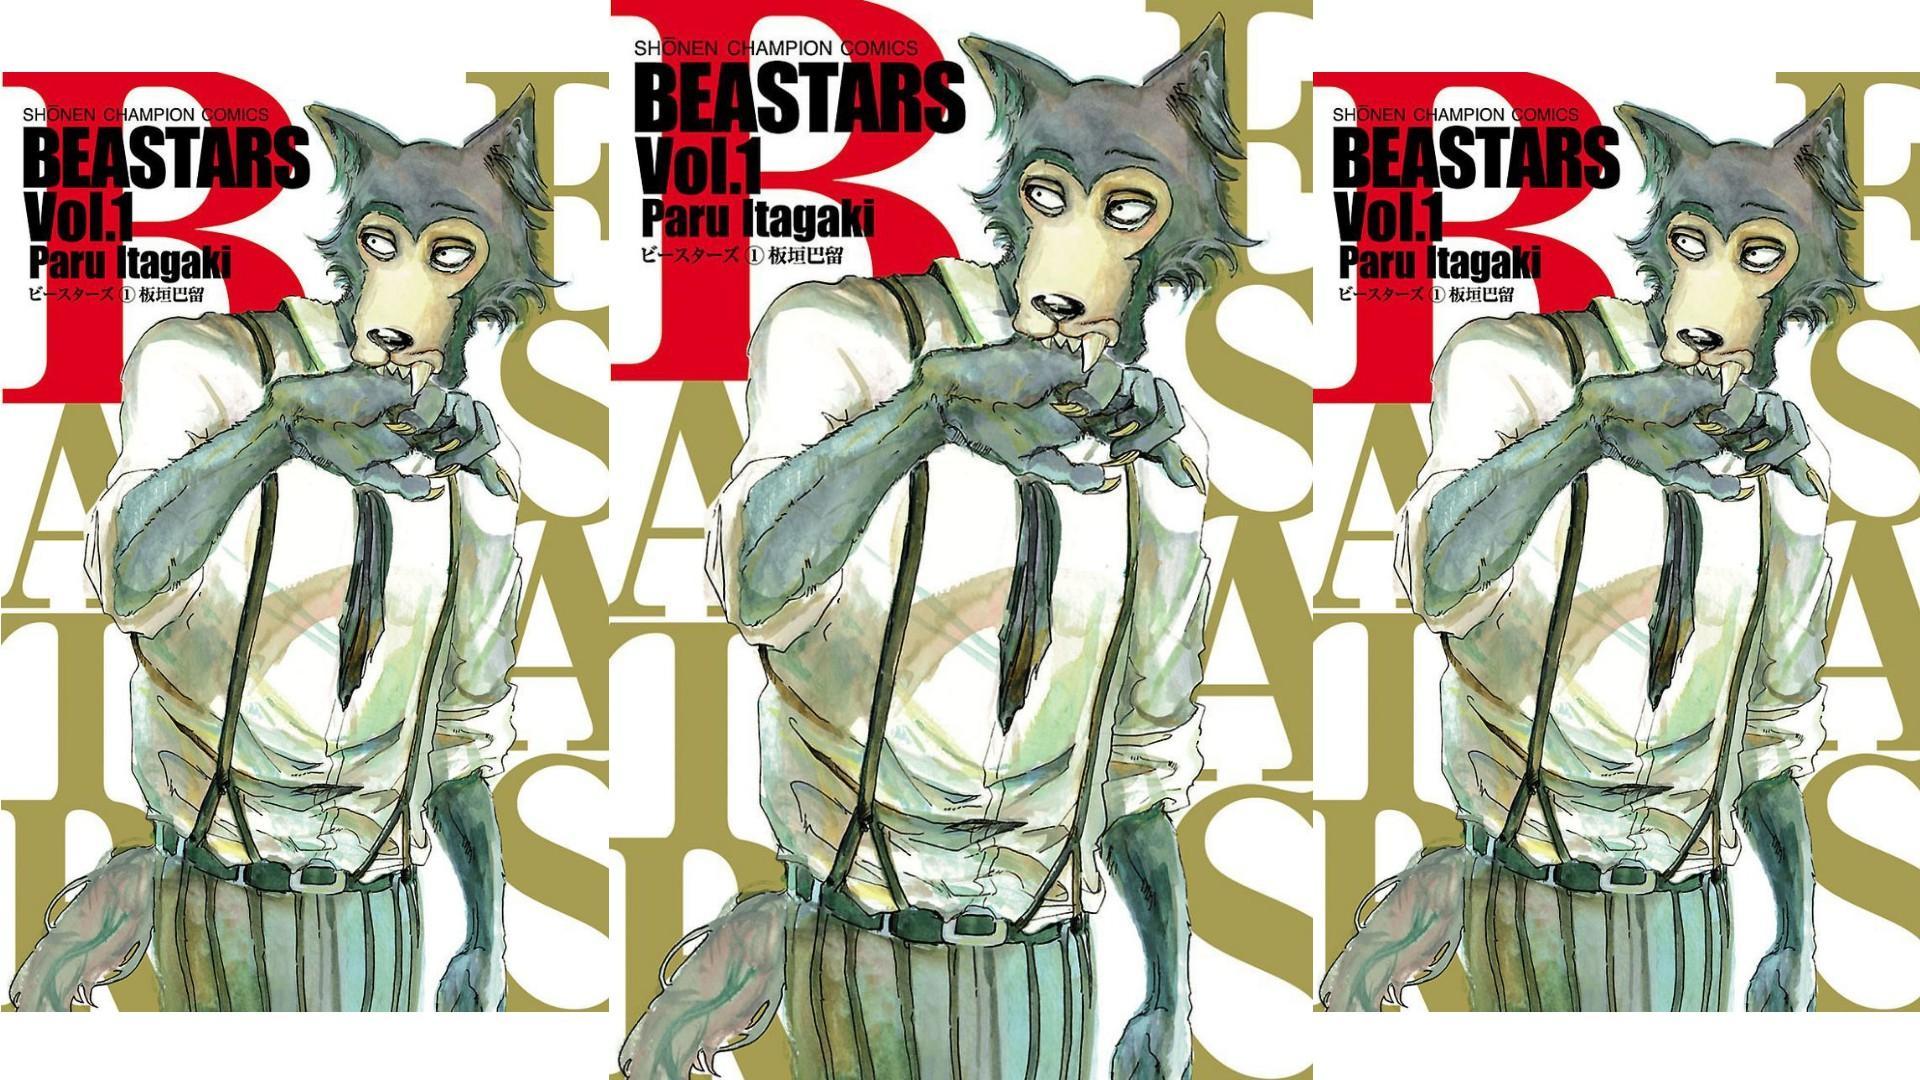 1920x1080 BEASTARS TV Anime | Anonesan